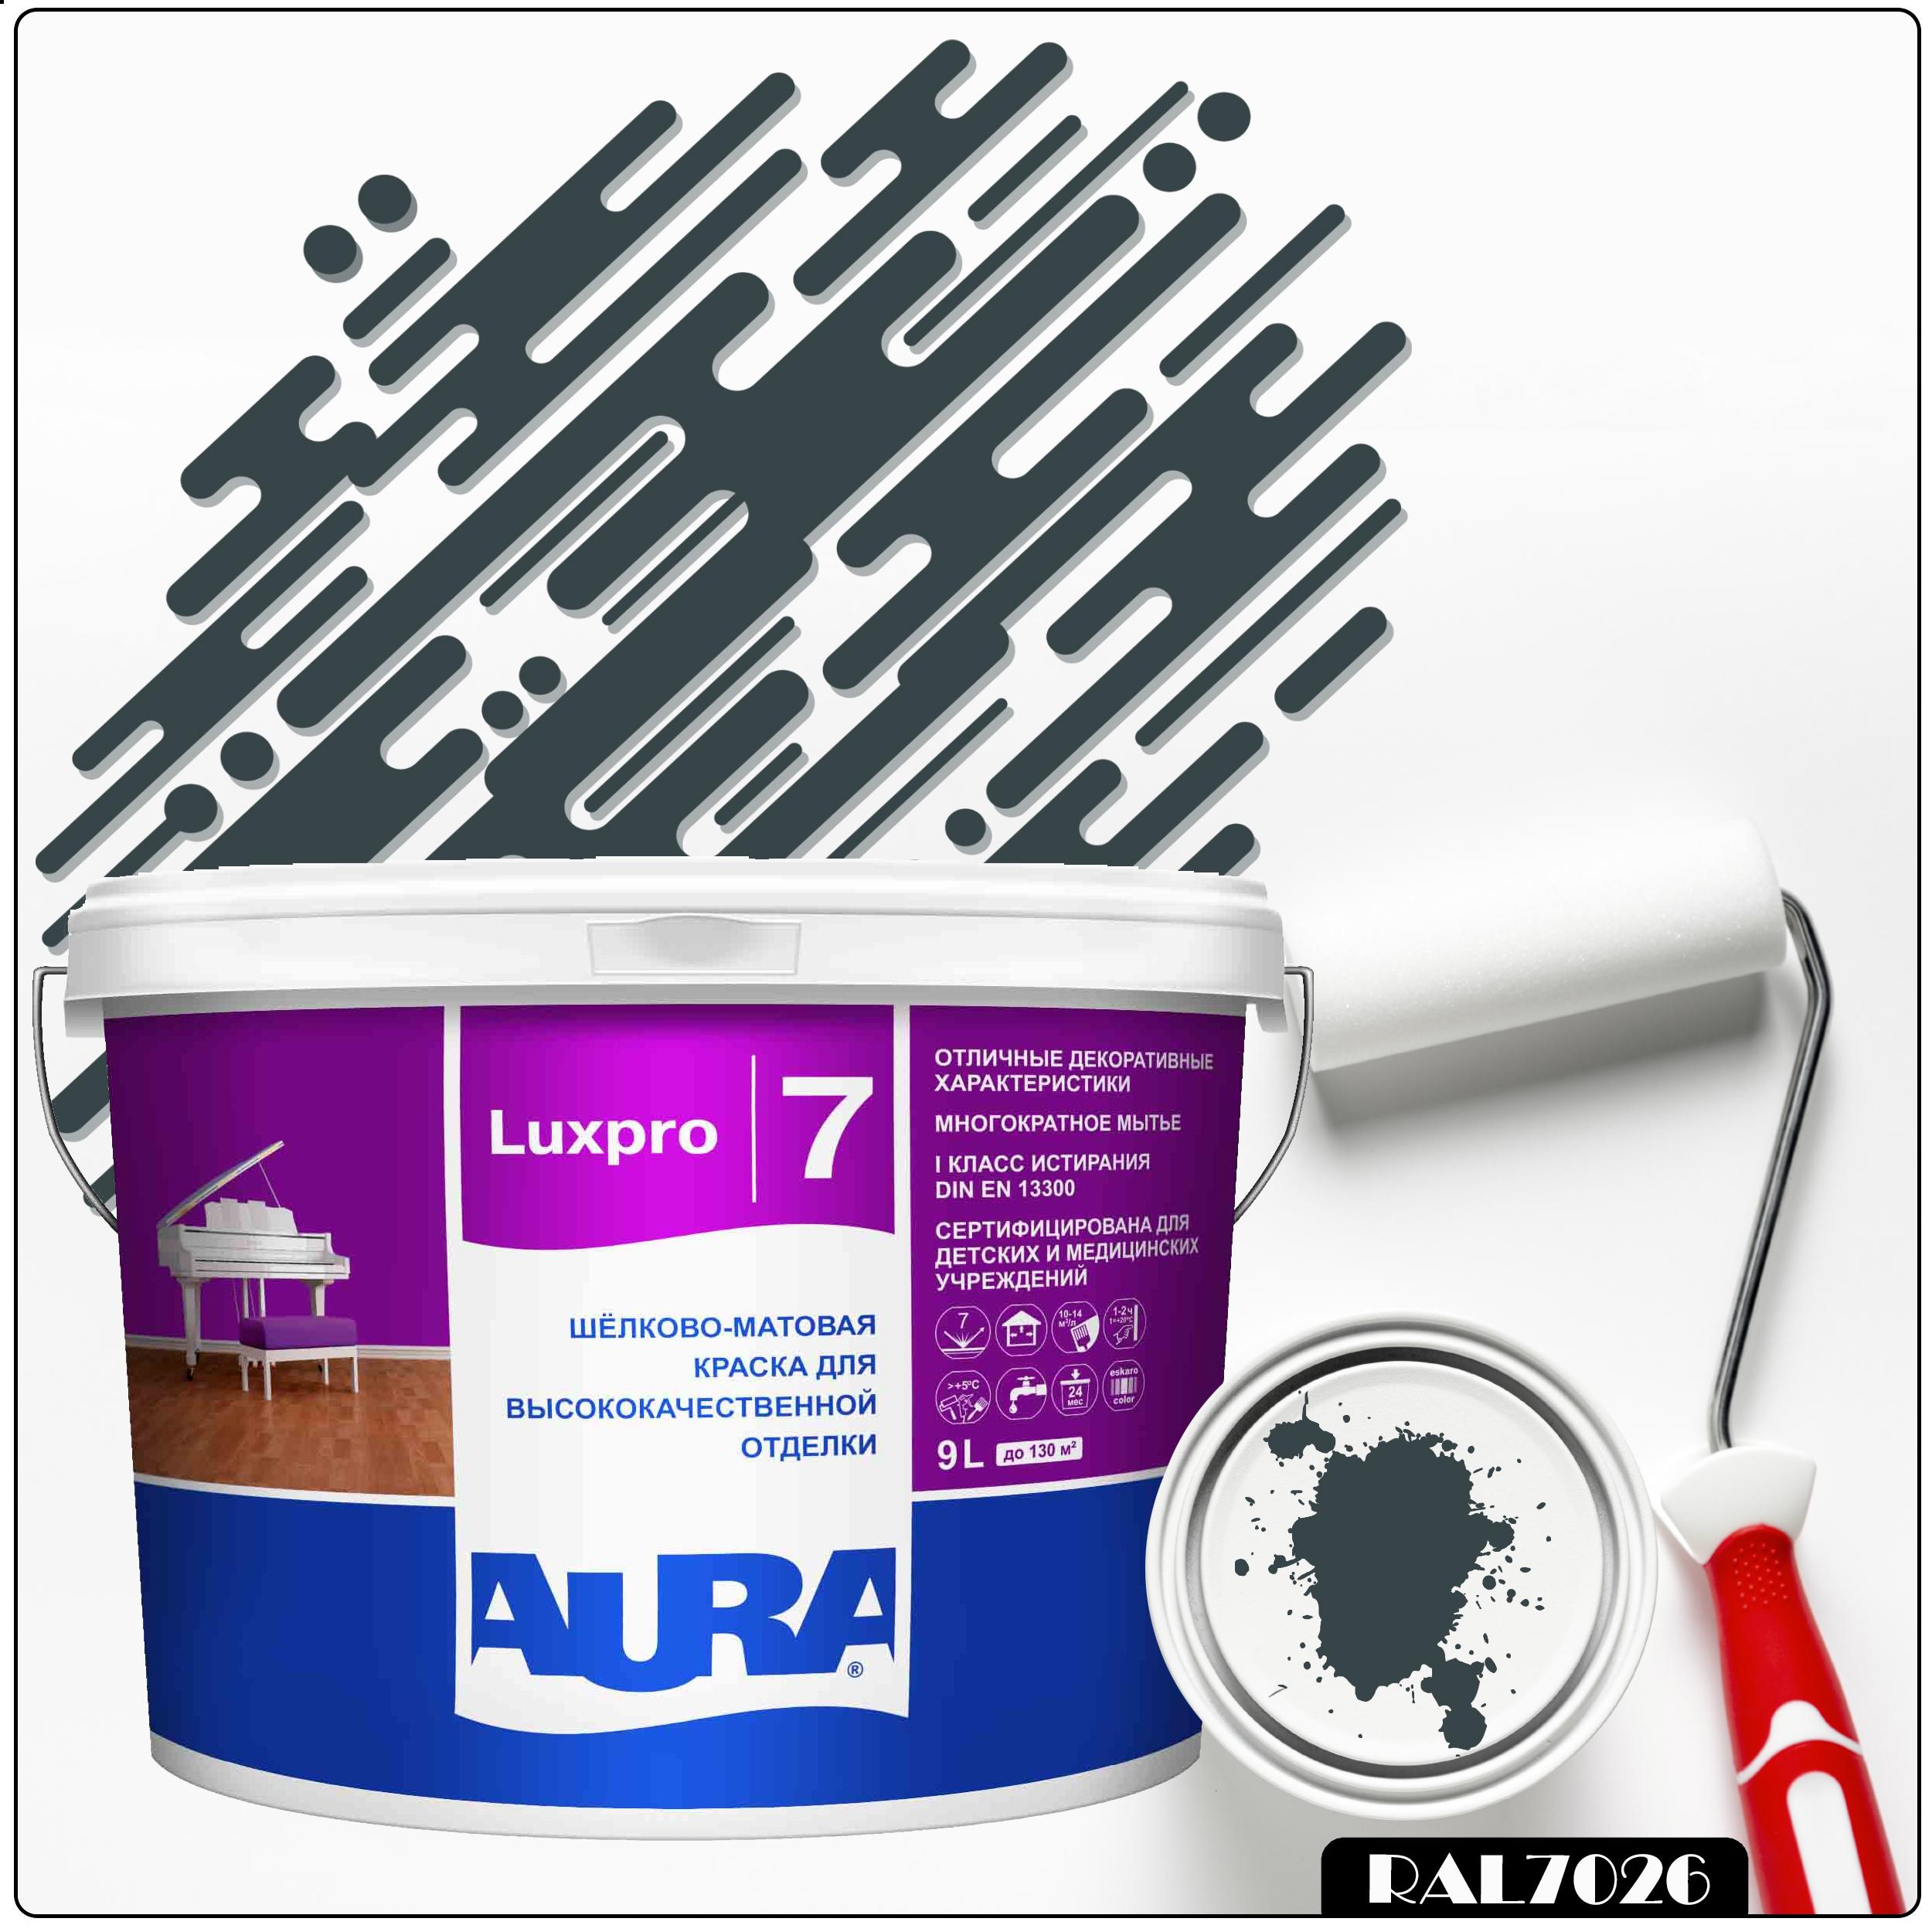 Фото 20 - Краска Aura LuxPRO 7, RAL 7026 Серый гранит, латексная, шелково-матовая, интерьерная, 9л, Аура.